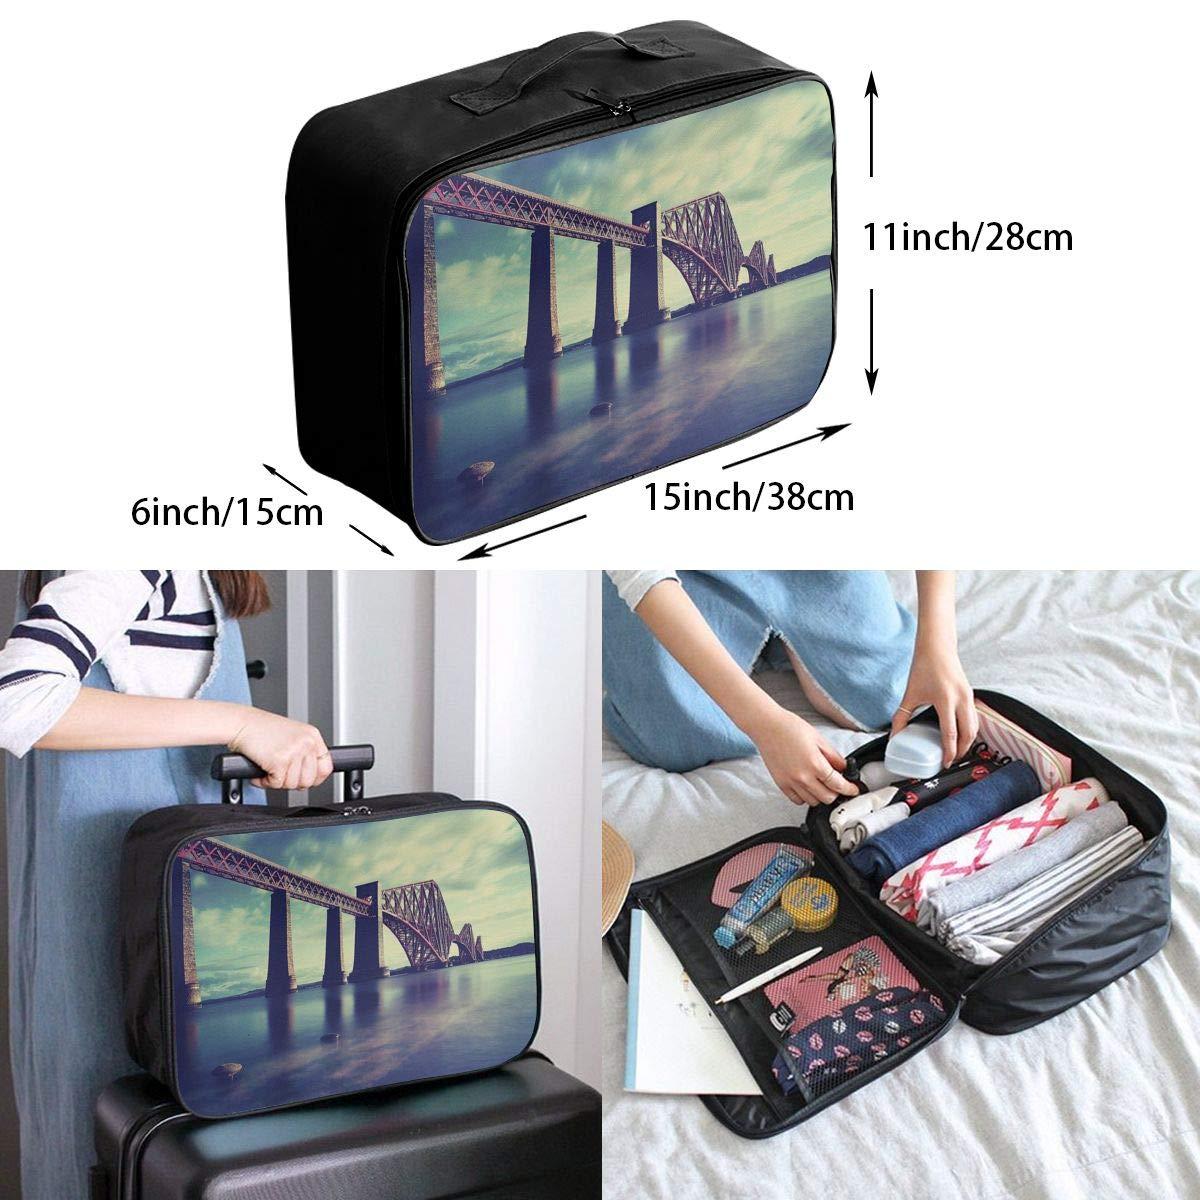 Travel Luggage Duffle Bag Lightweight Portable Handbag Bridge Pattern Large Capacity Waterproof Foldable Storage Tote